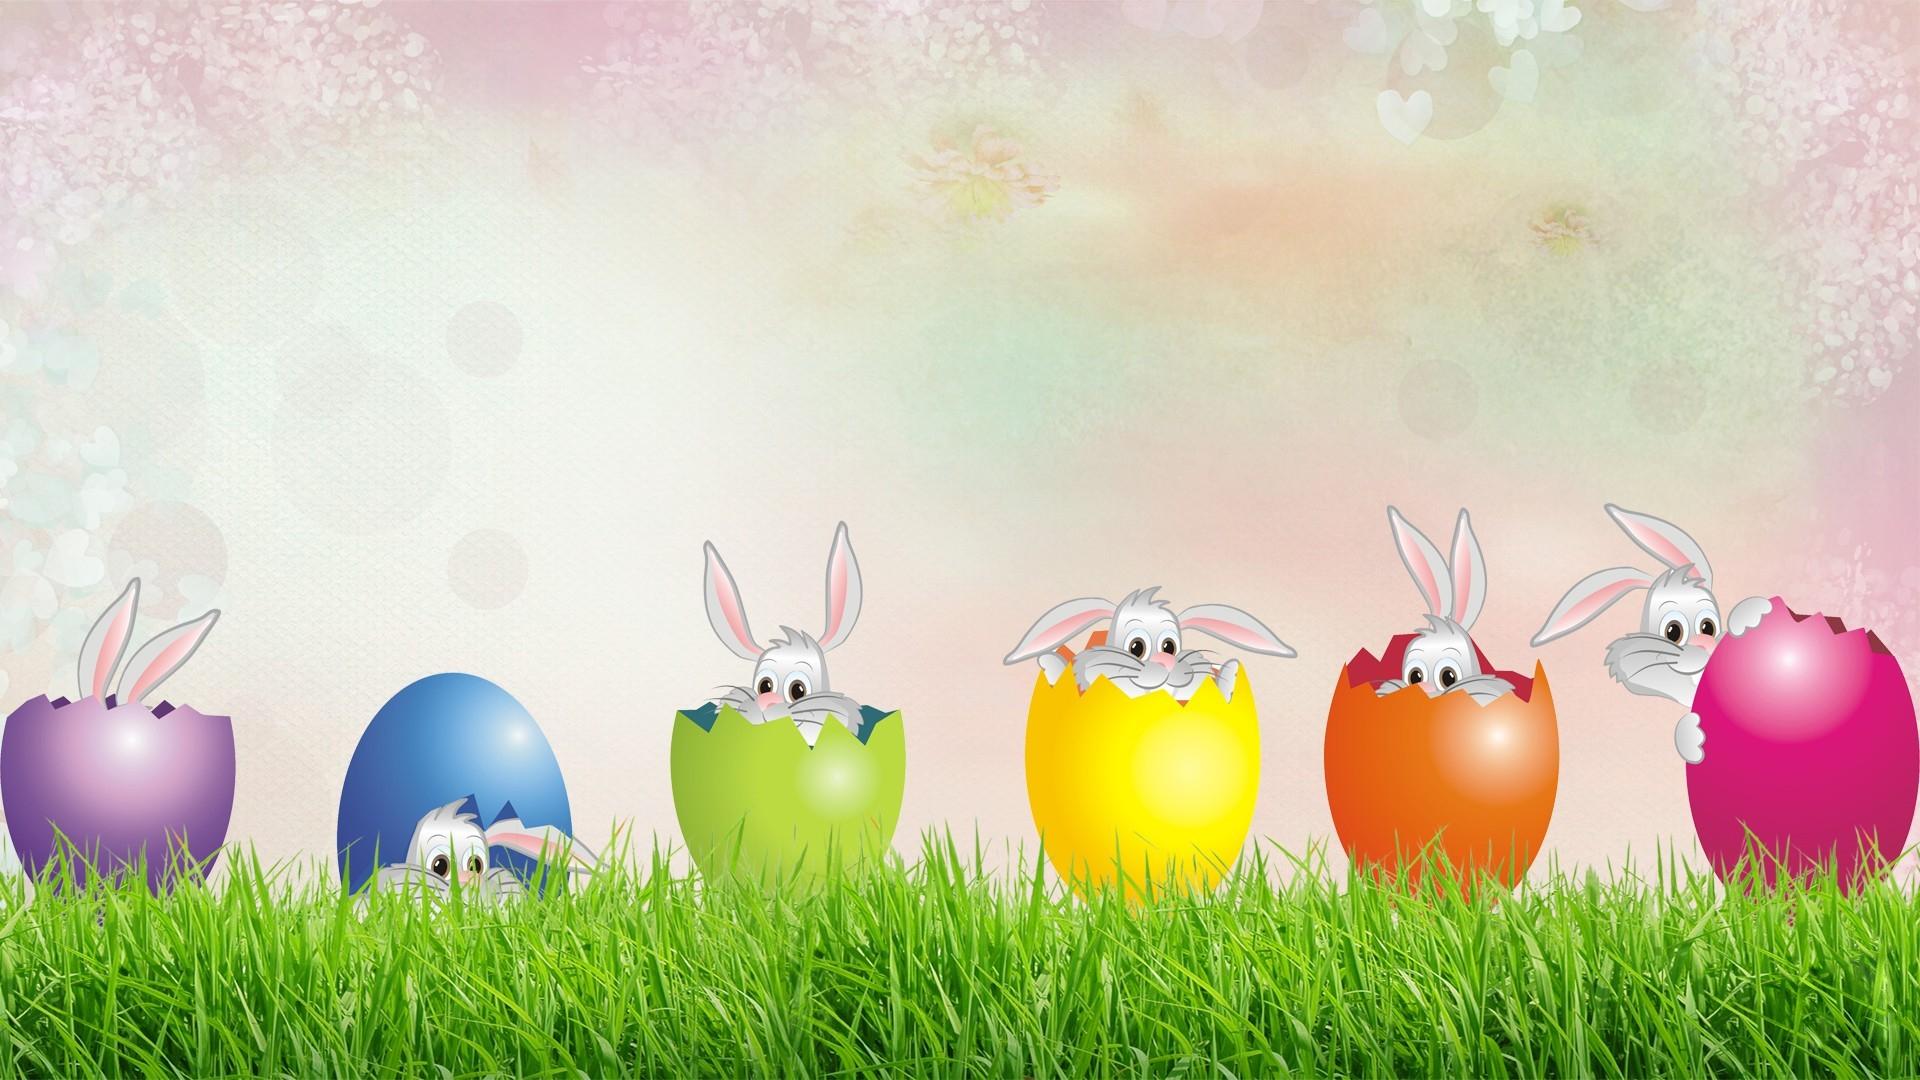 Happy easter hd wallpaper background image 1920x1080 - Easter desktop wallpaper ...